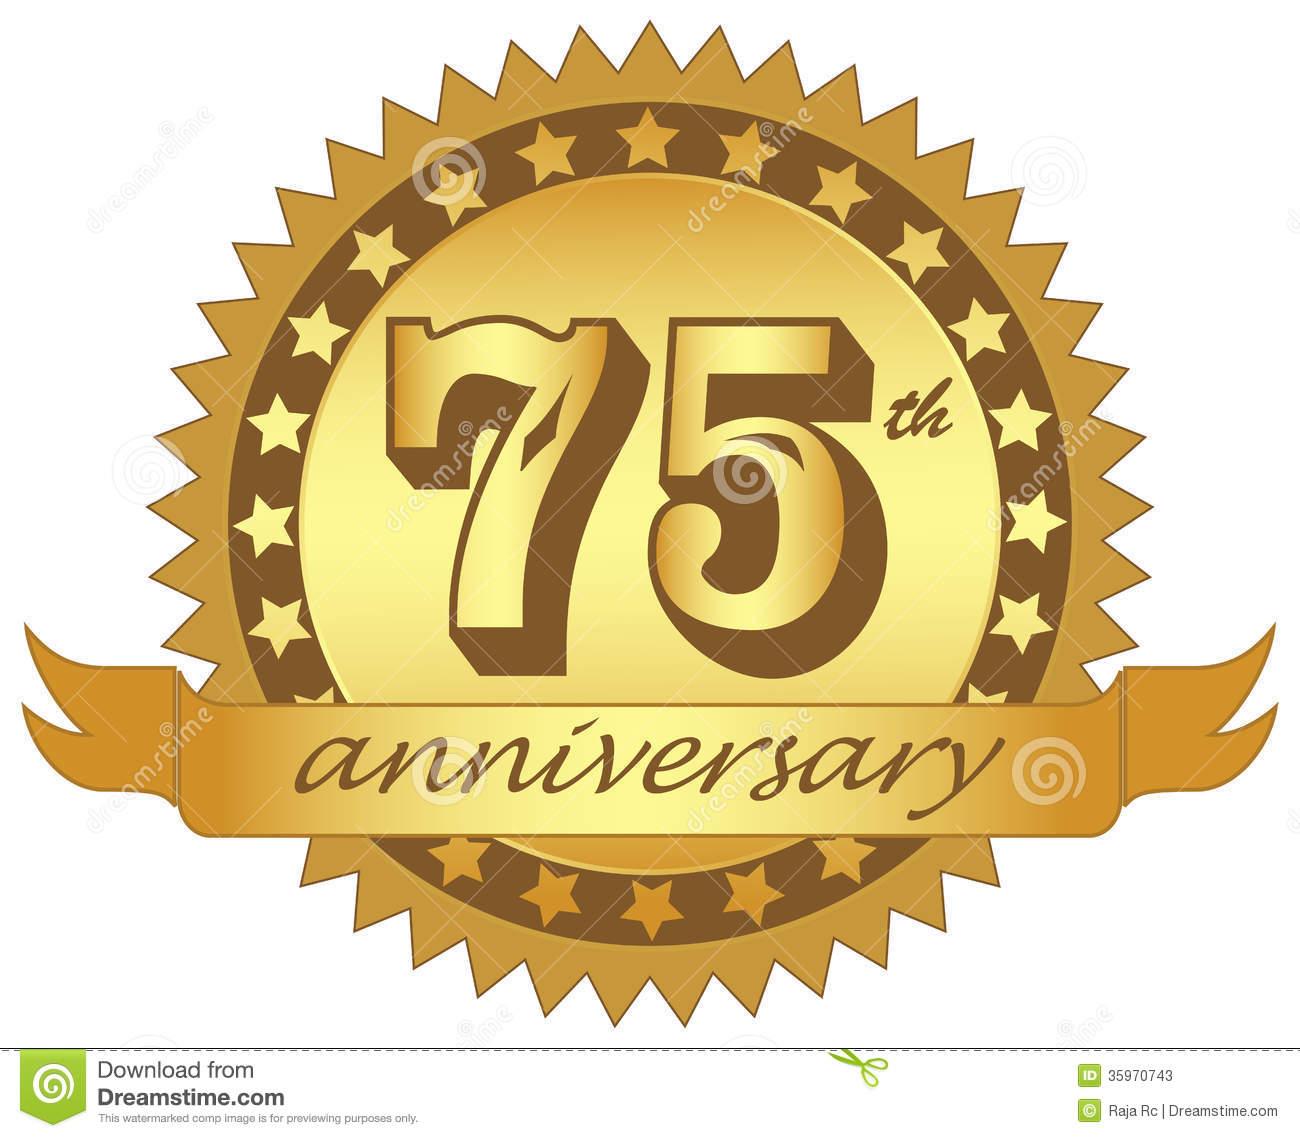 anniversary logo vector - photo #18